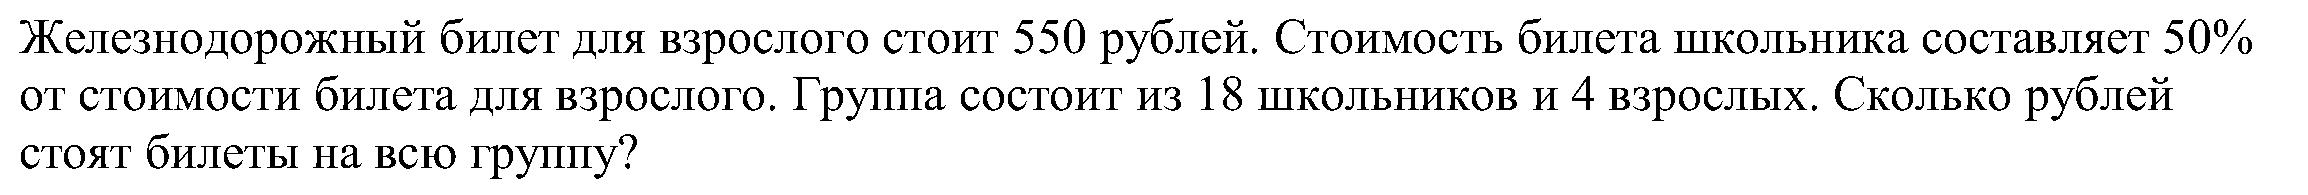 hello_html_11c2c53e.png